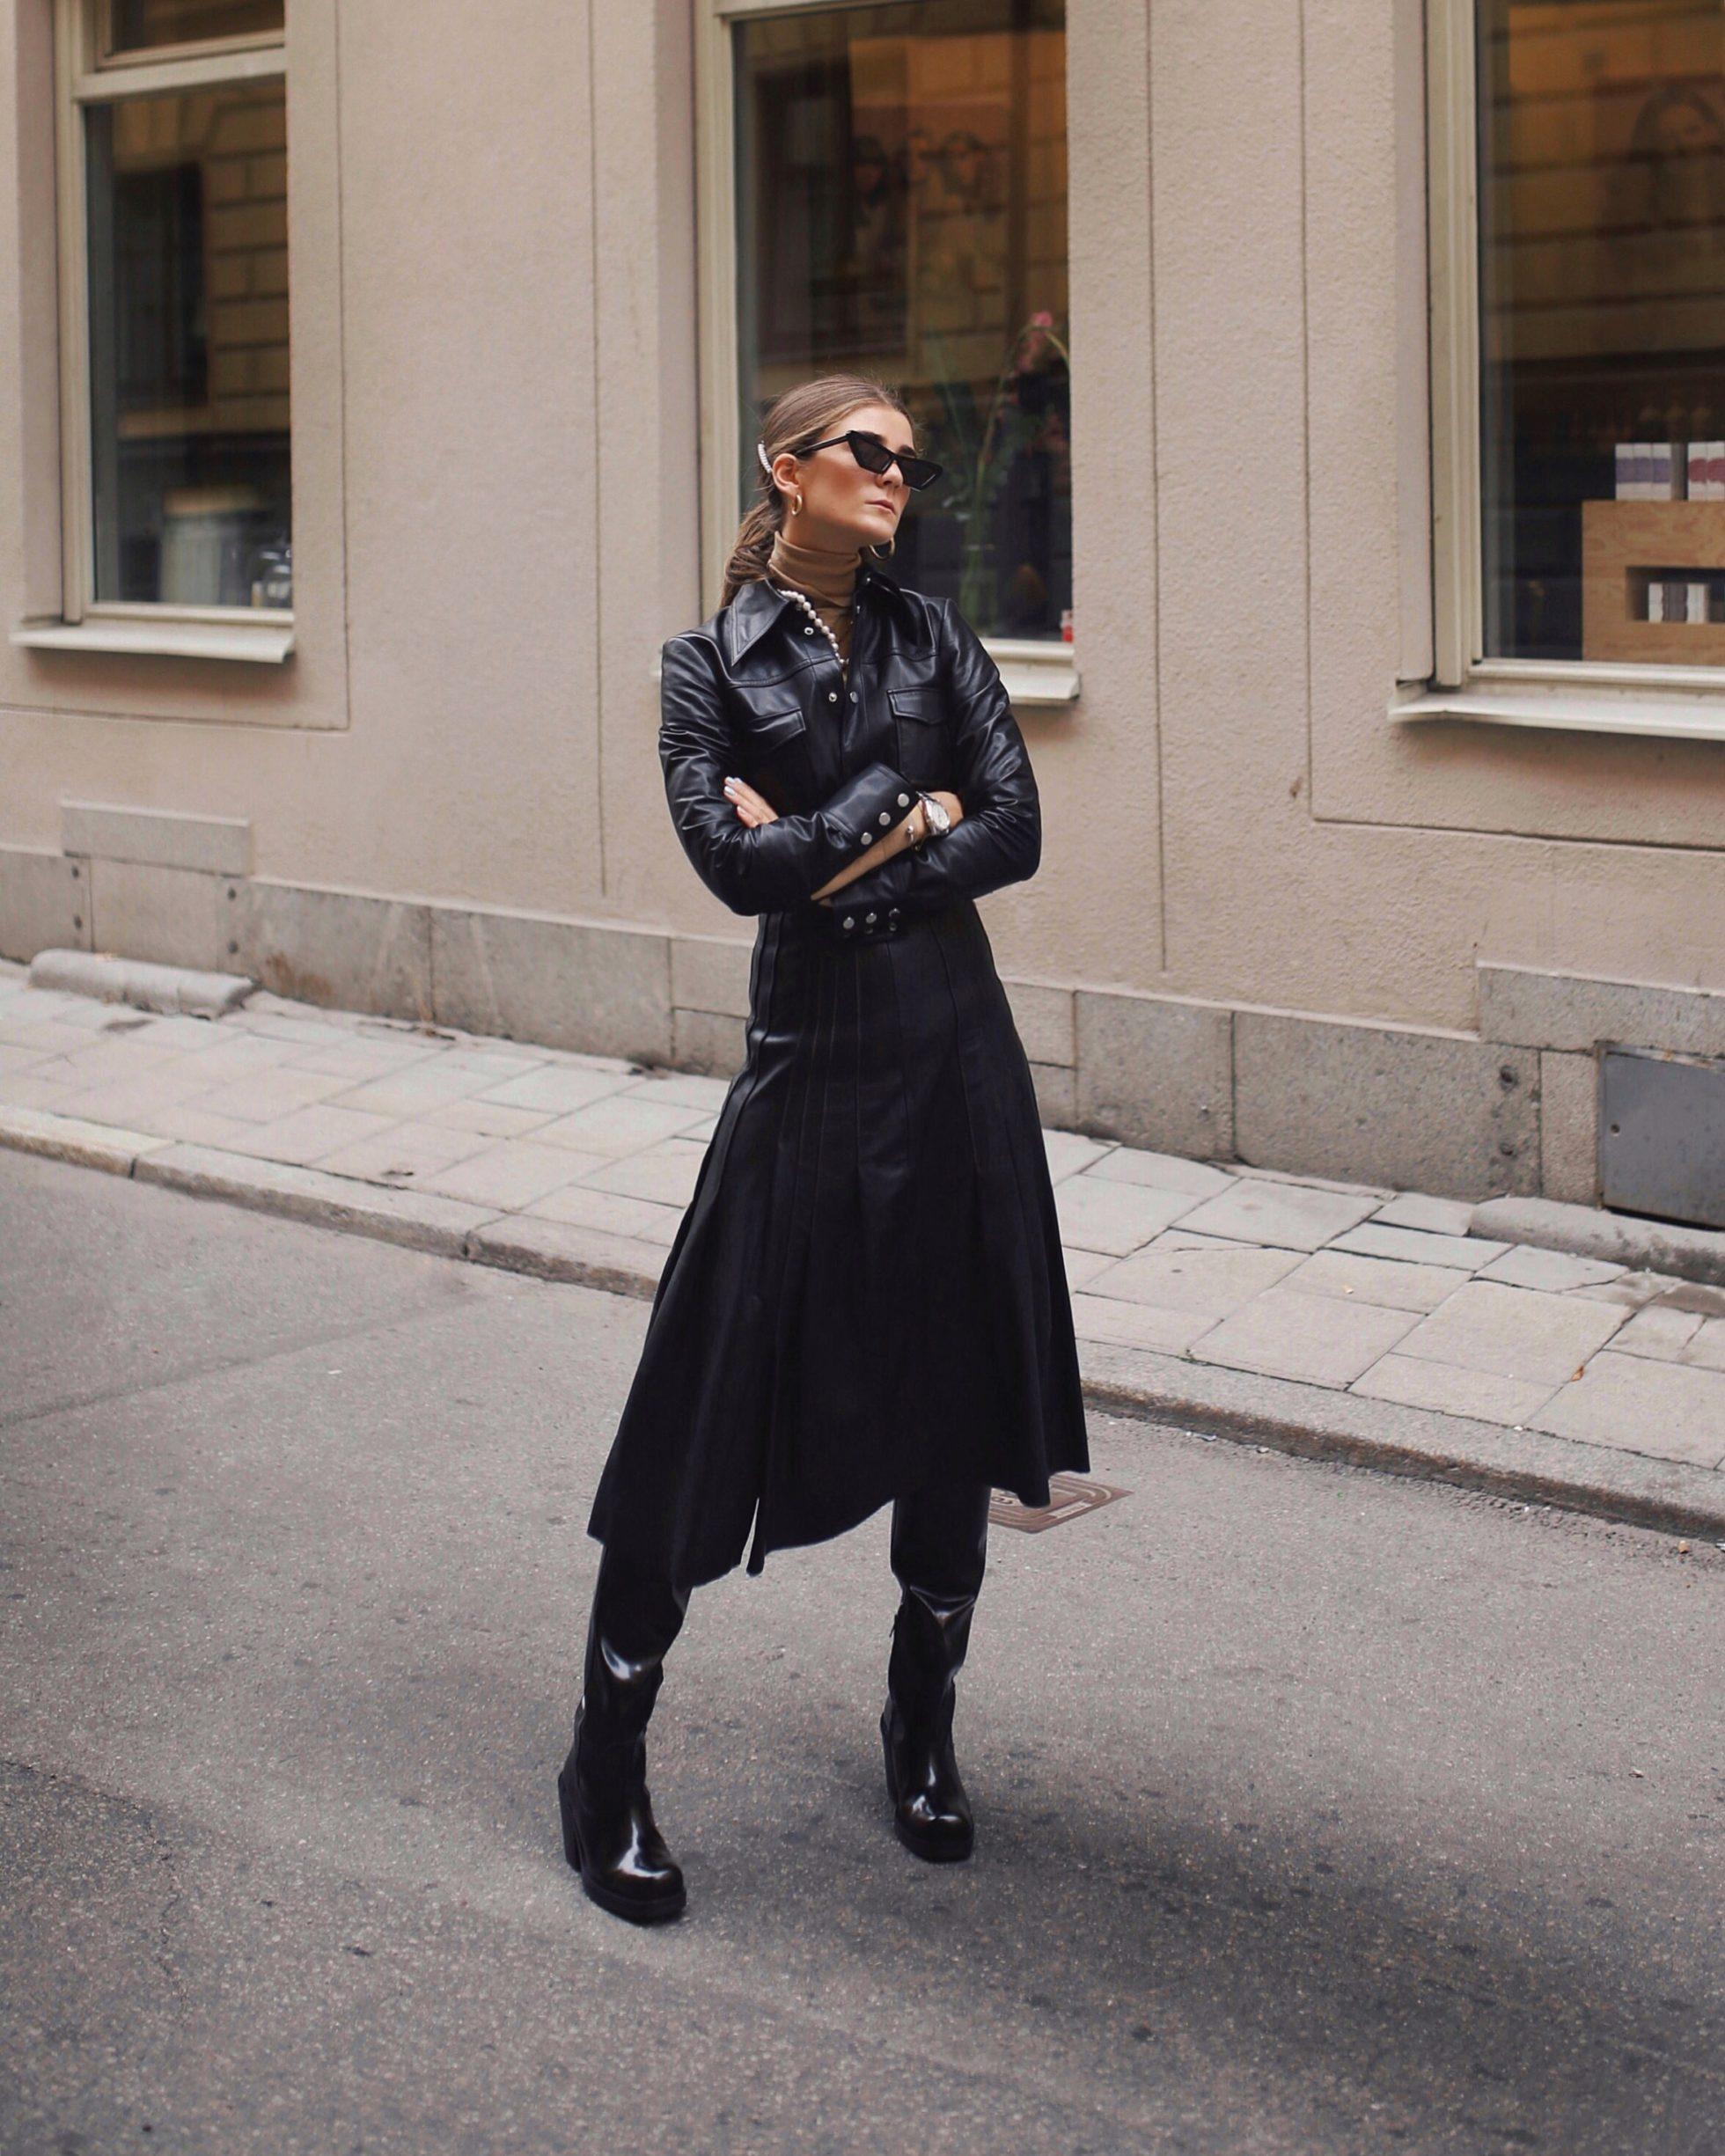 H&M Studio AW18 | Linn Eklund